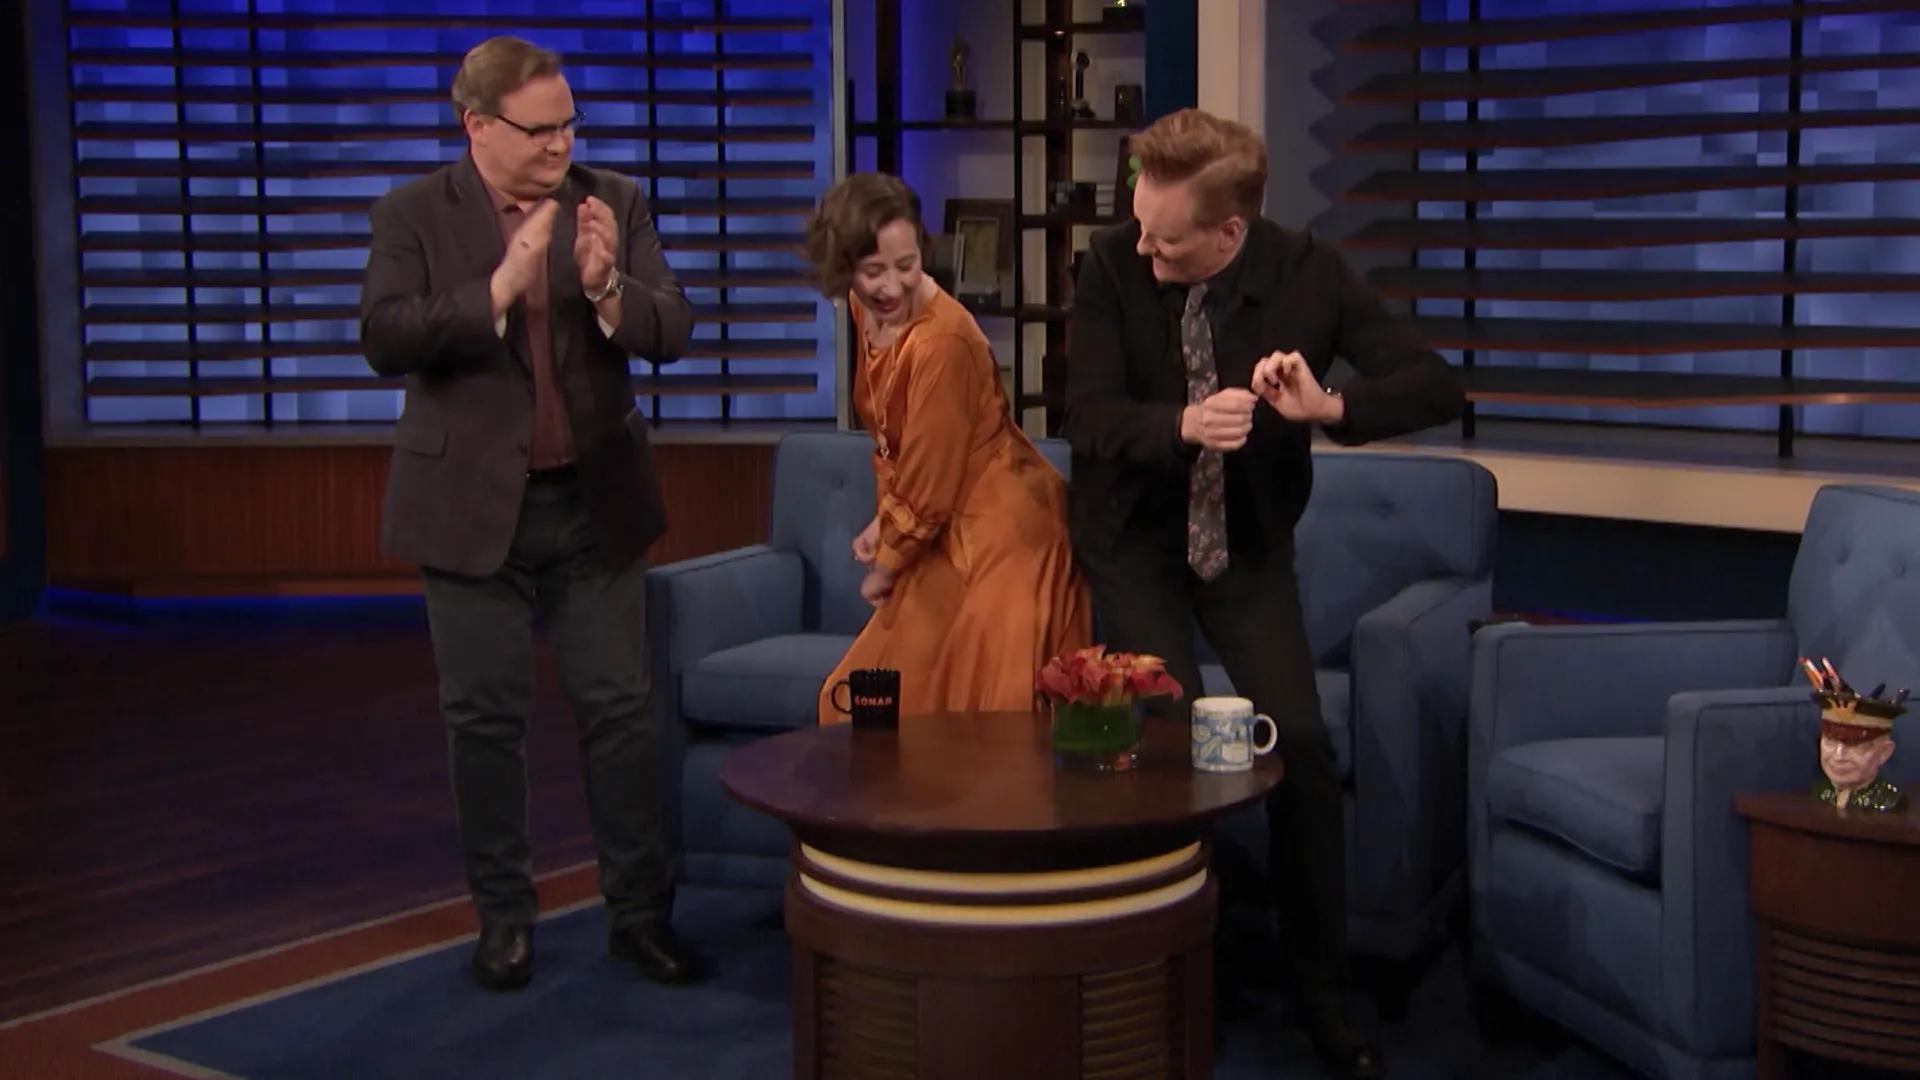 Conan O'Brien, Andy Richter, and Kristen Schaal in Kristen Schaal/The Sklar Brothers (2020)